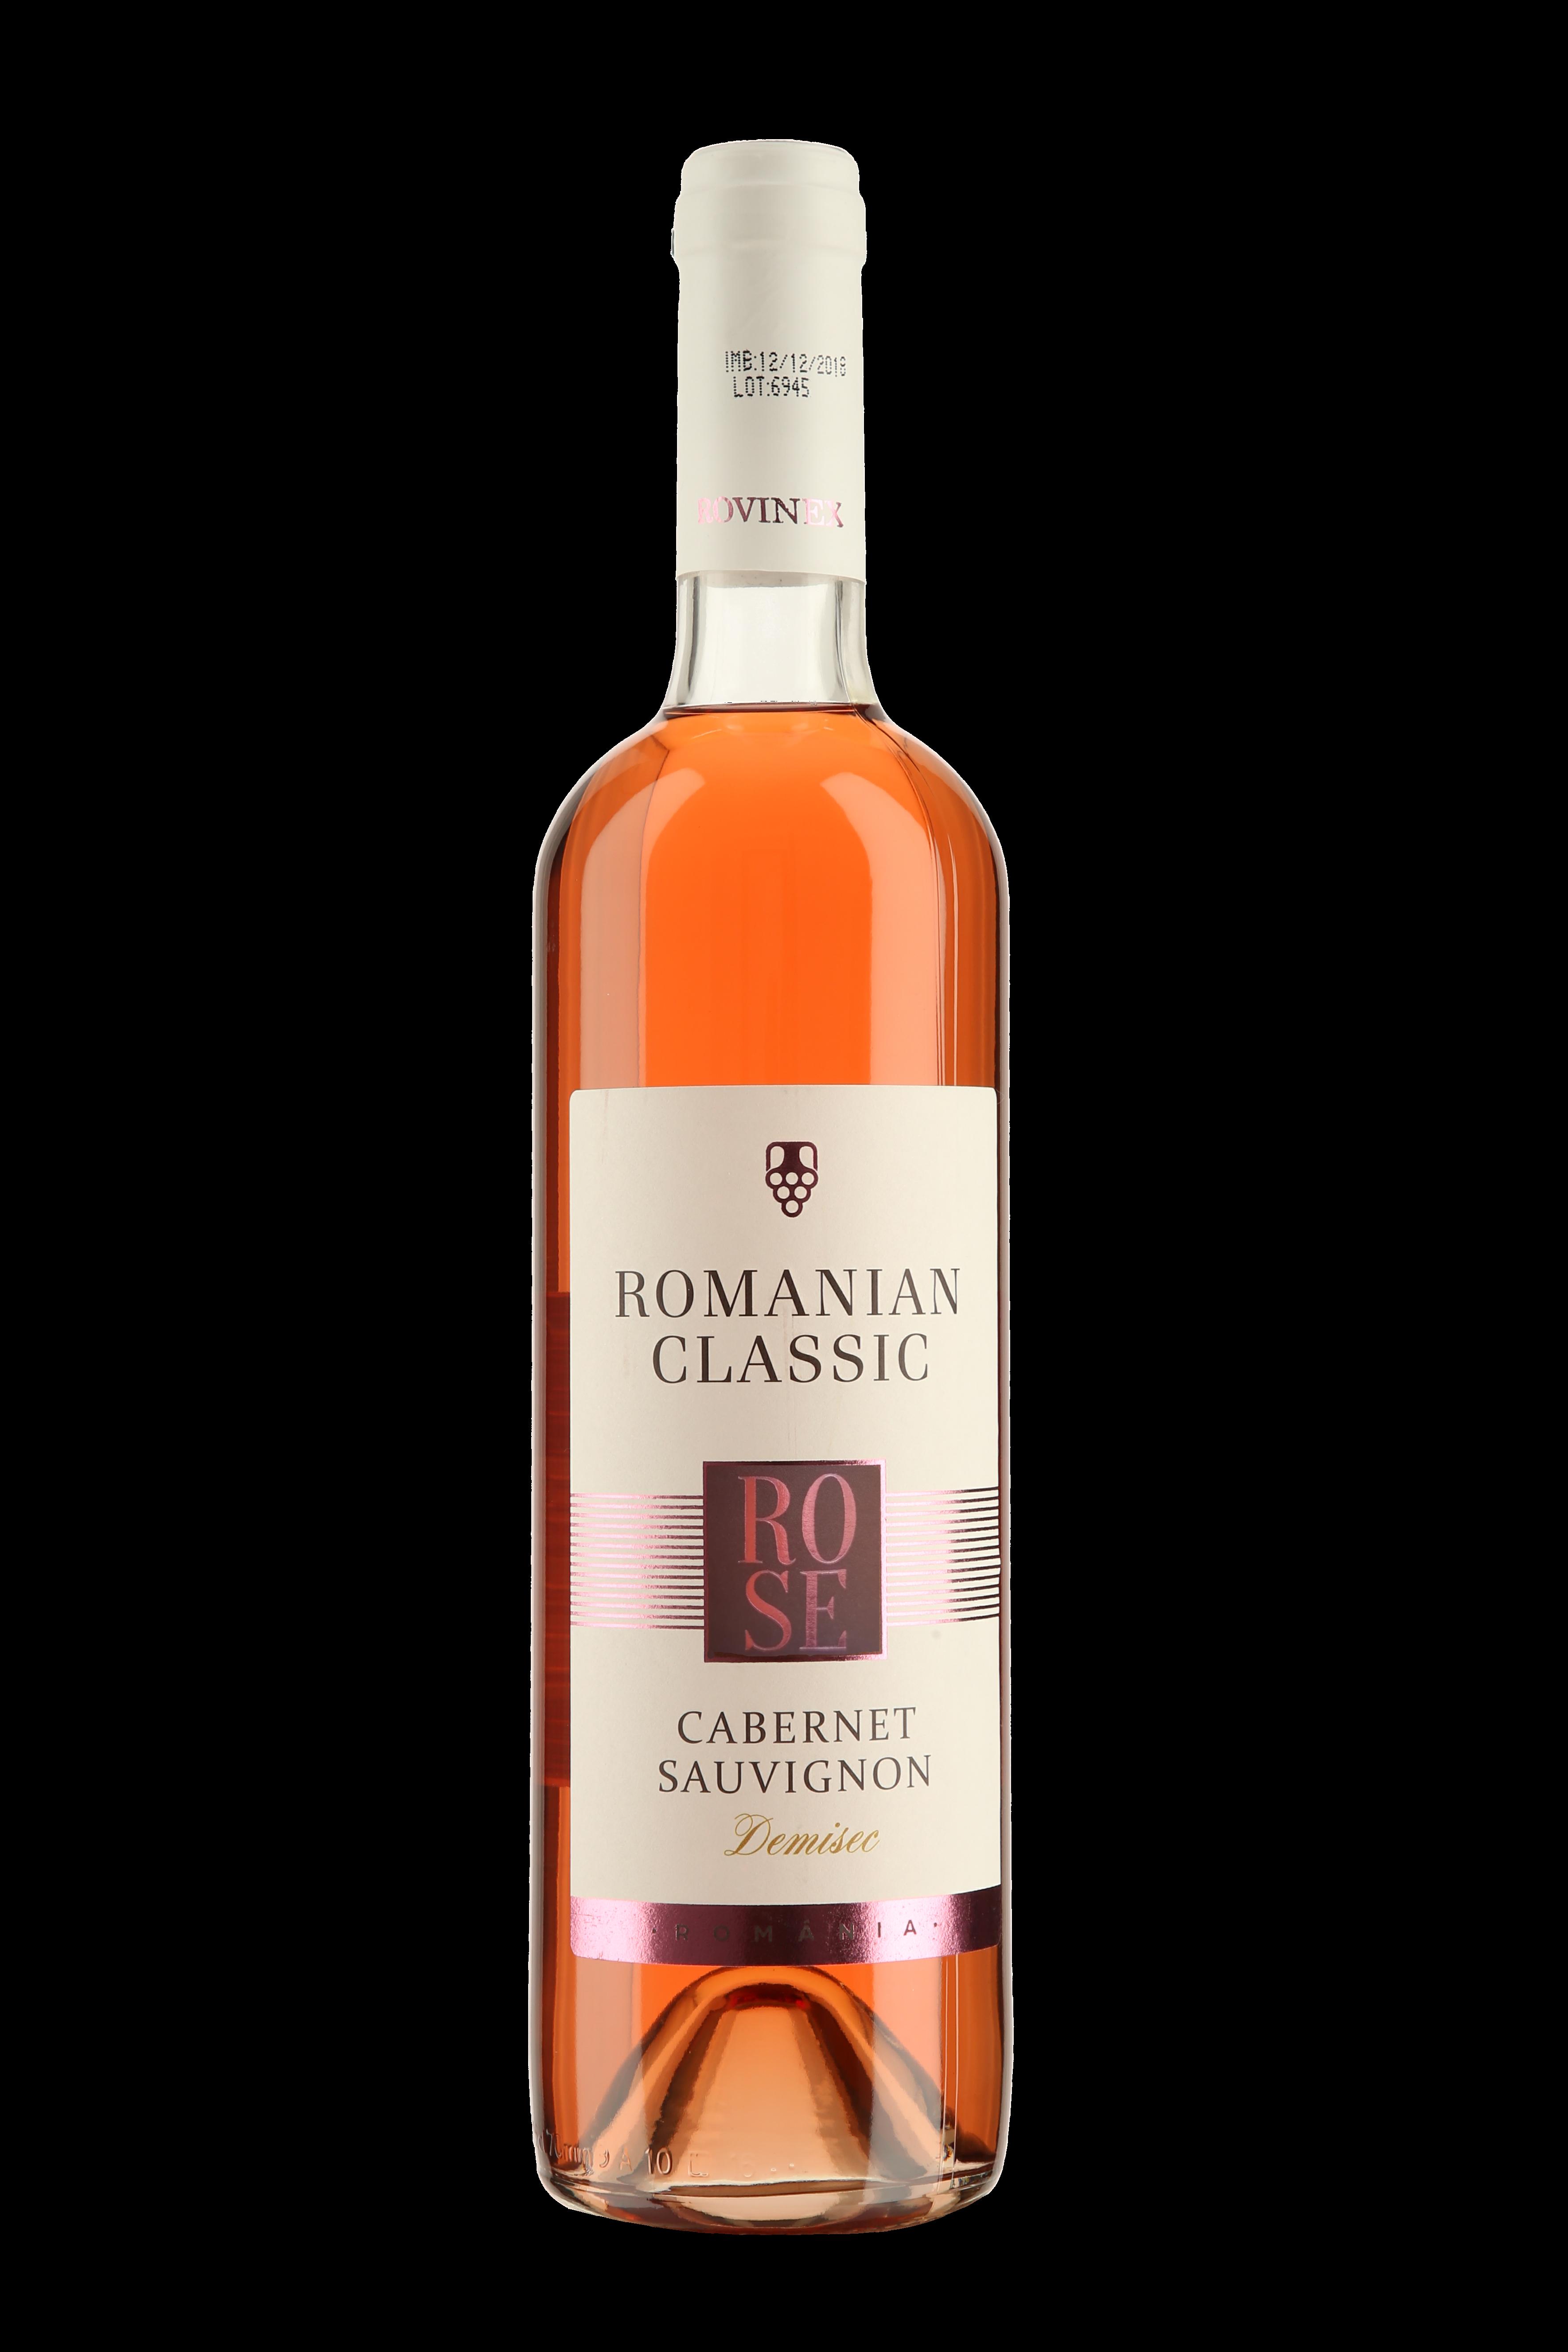 Cabernet Sauvignon Rose